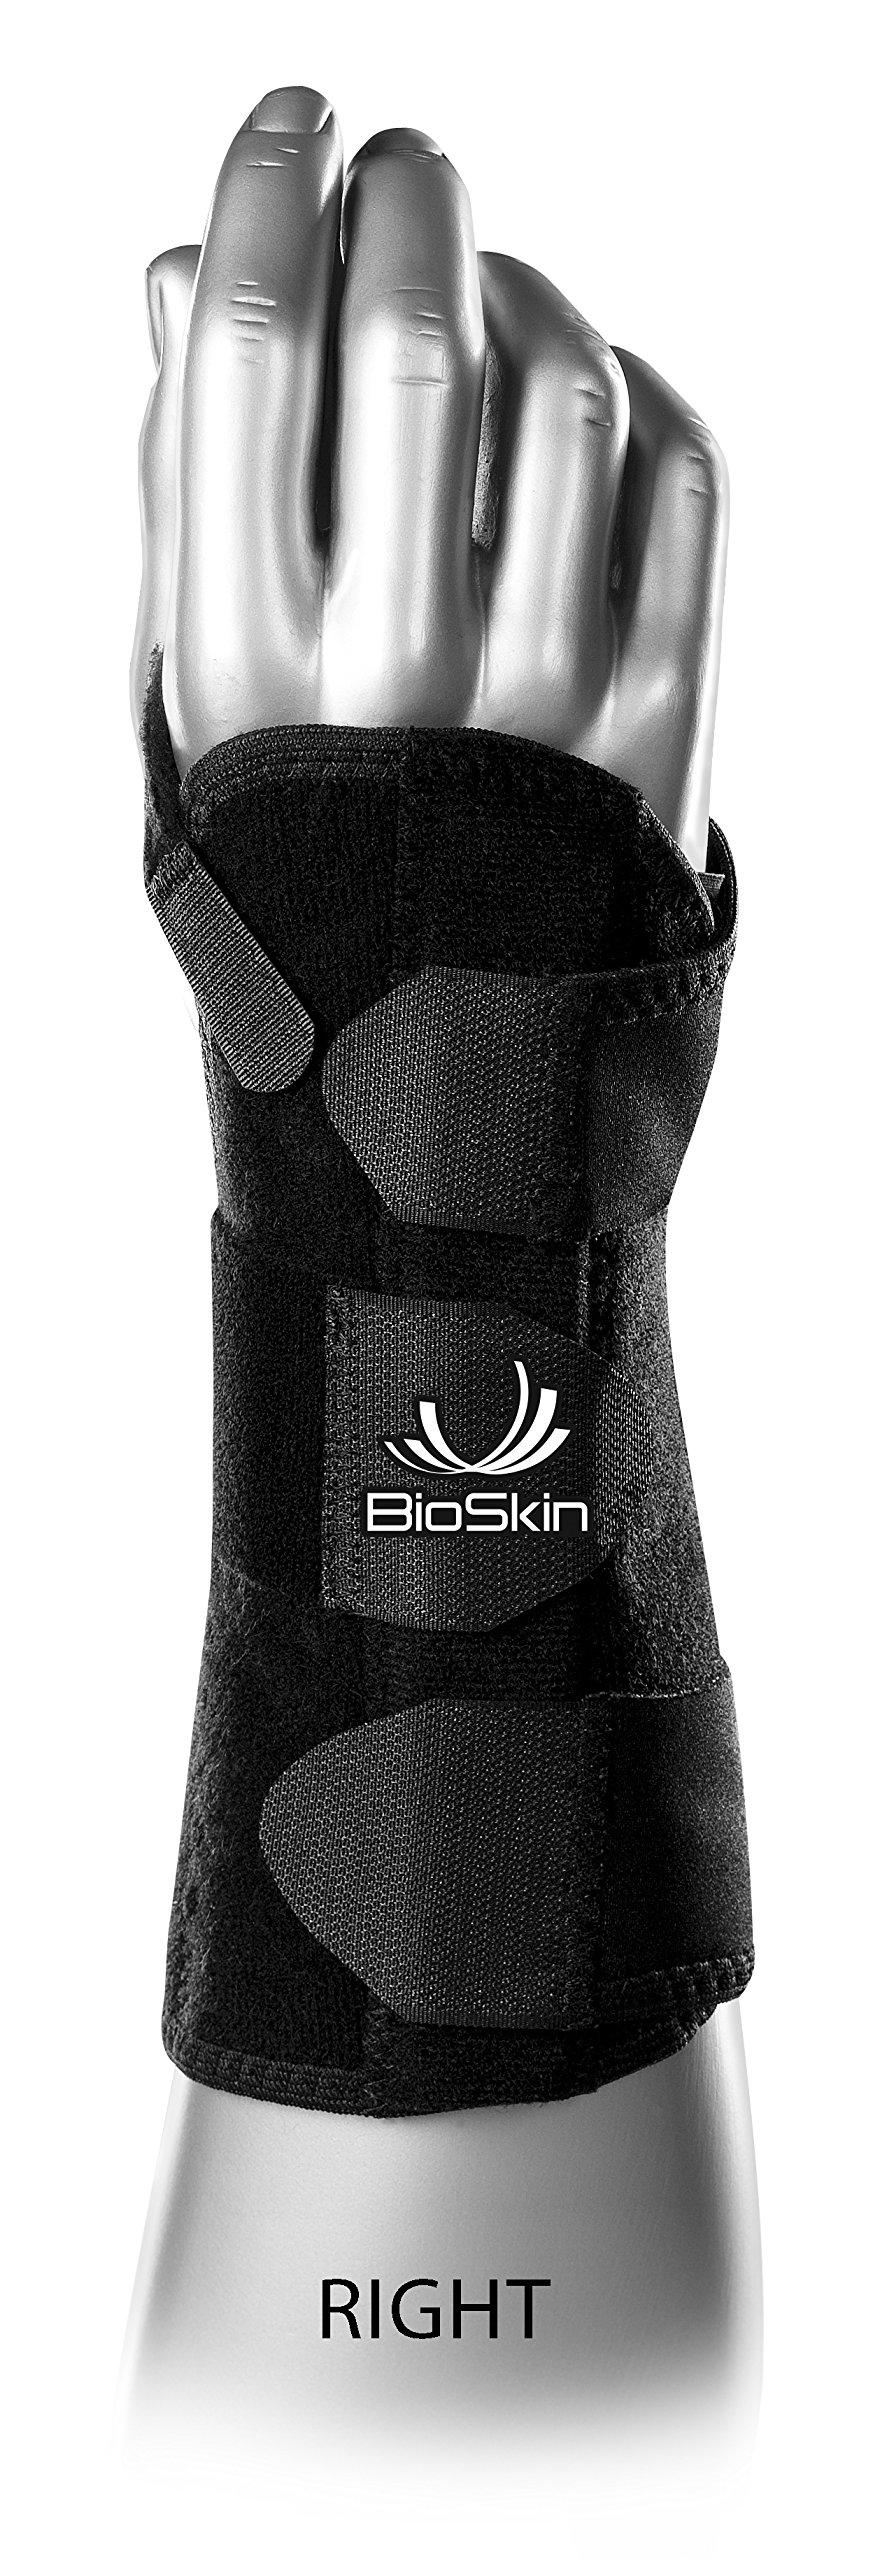 BioSkin DP3 Wrist Brace, Right, X-Small/Small